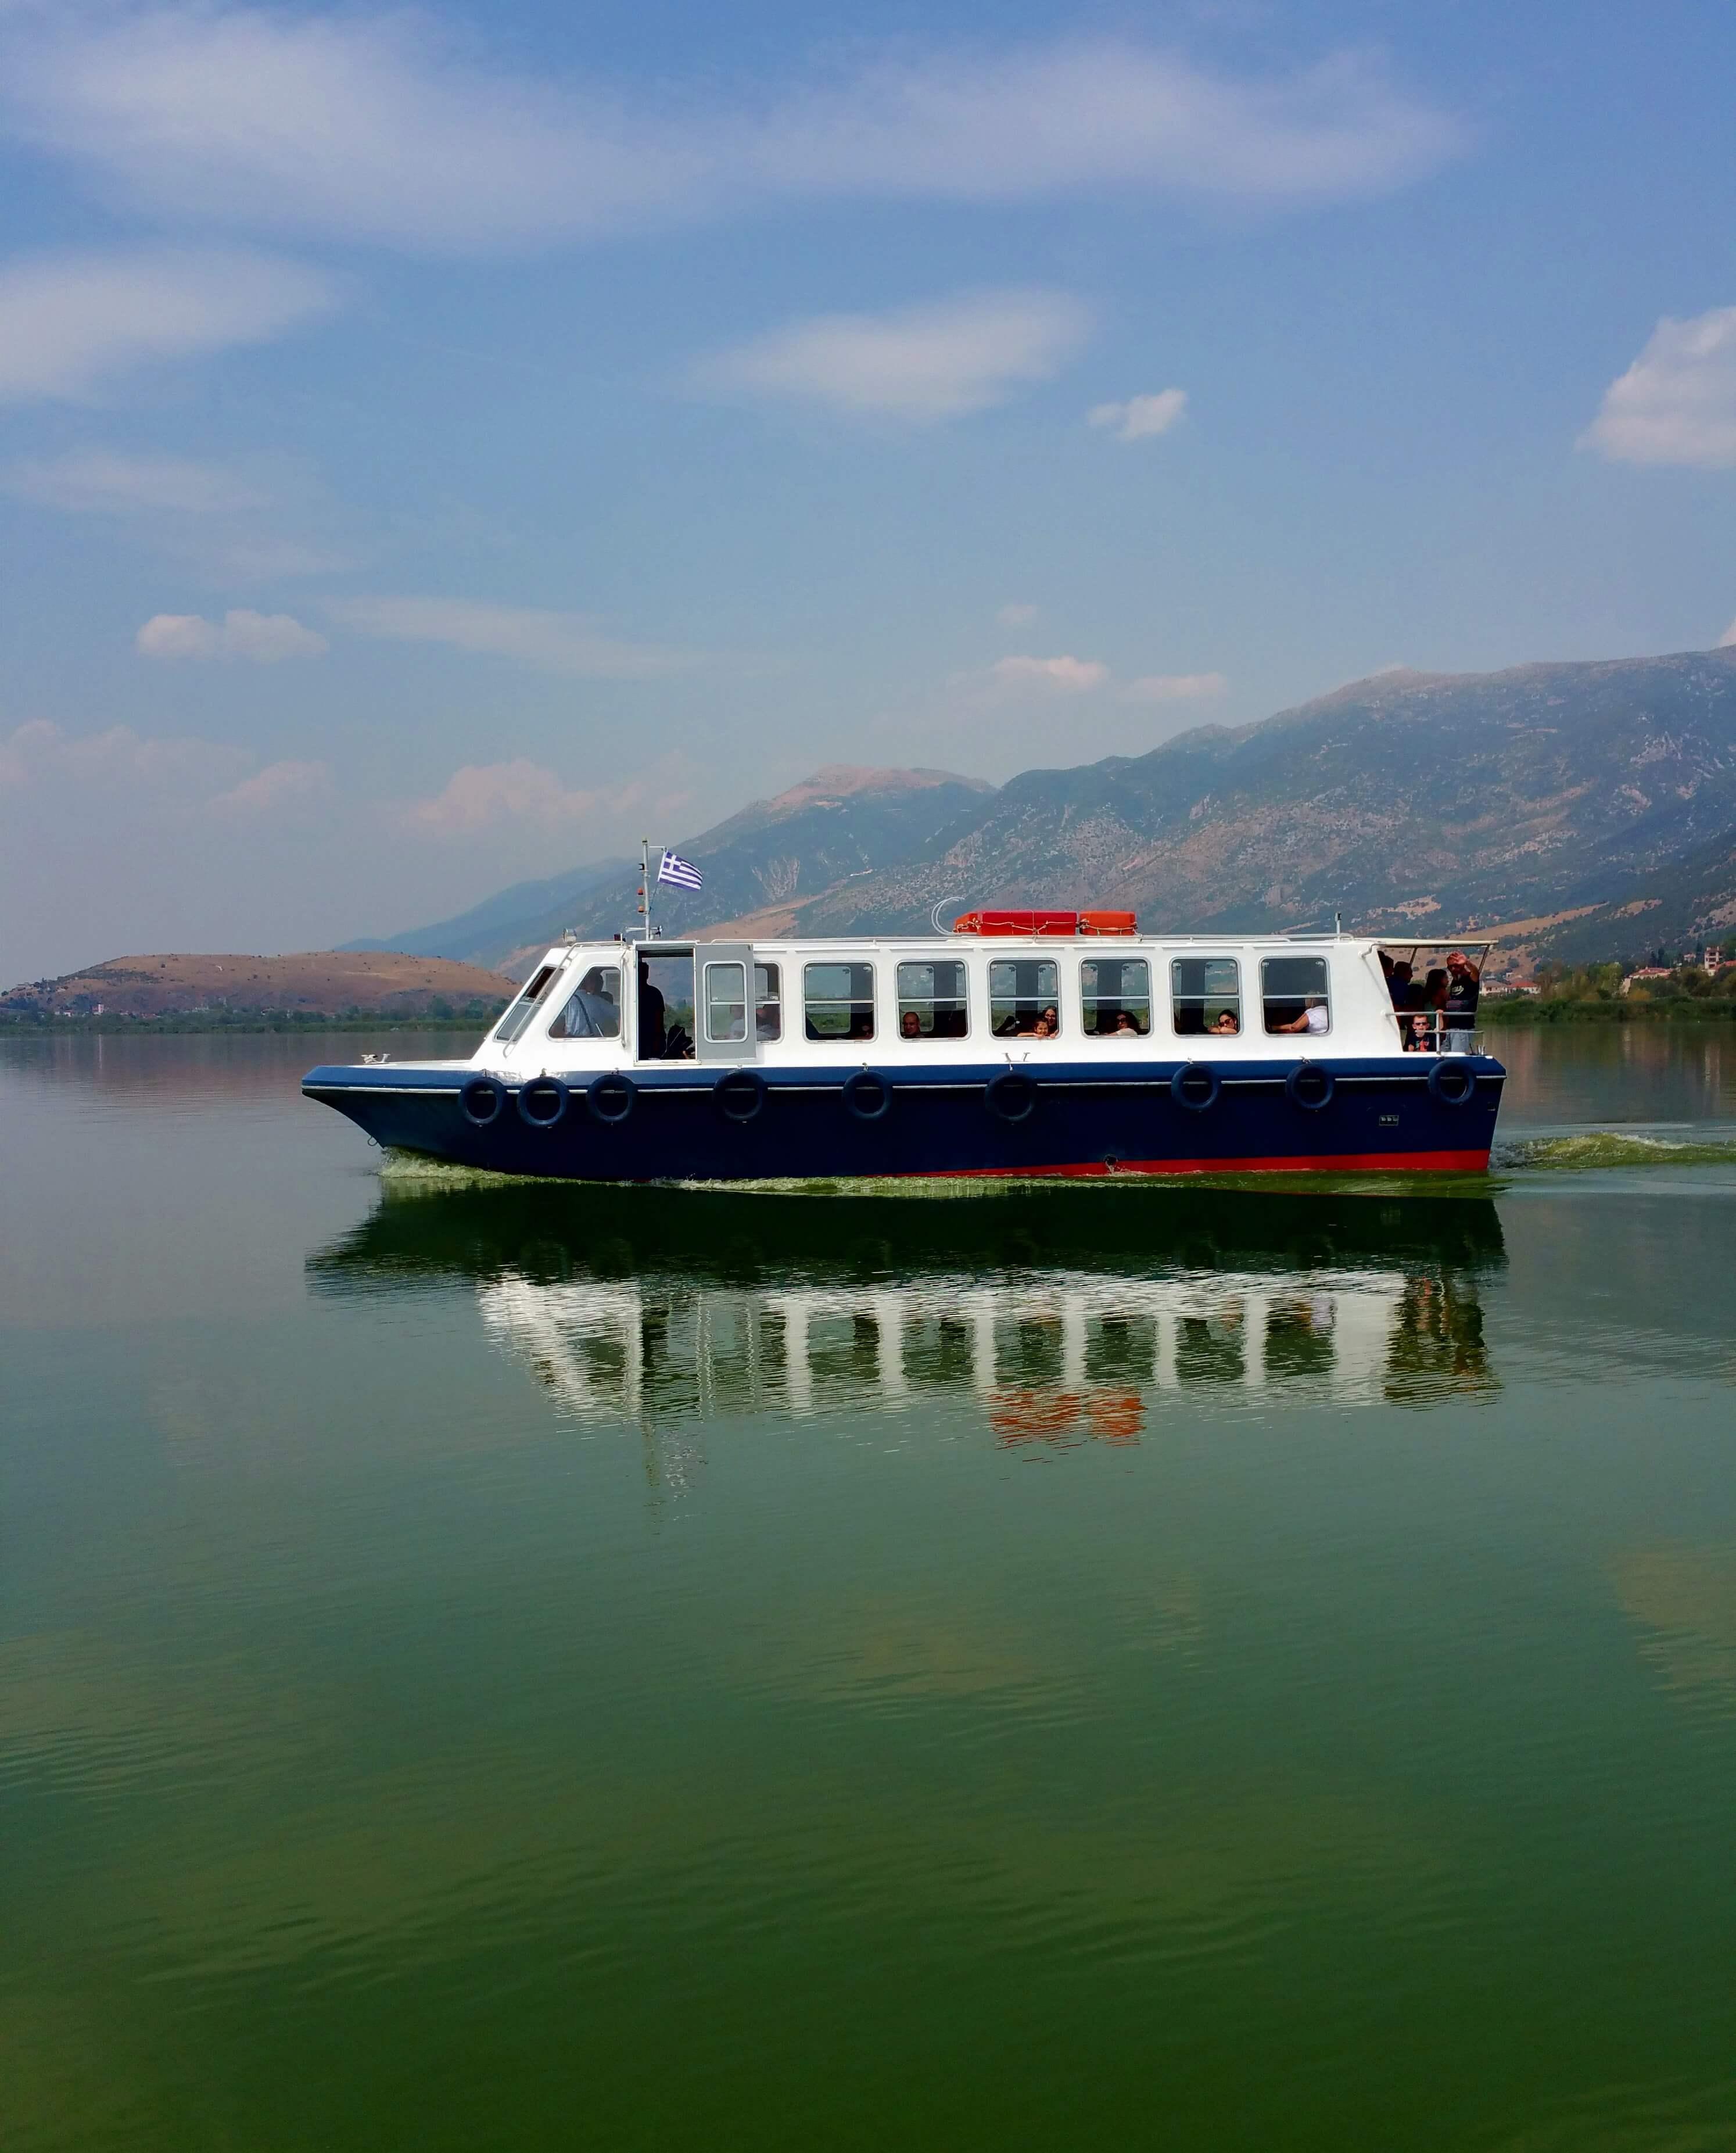 Lake Pamvotis, Ioannina, Greece | Kicking Back the Pebbles